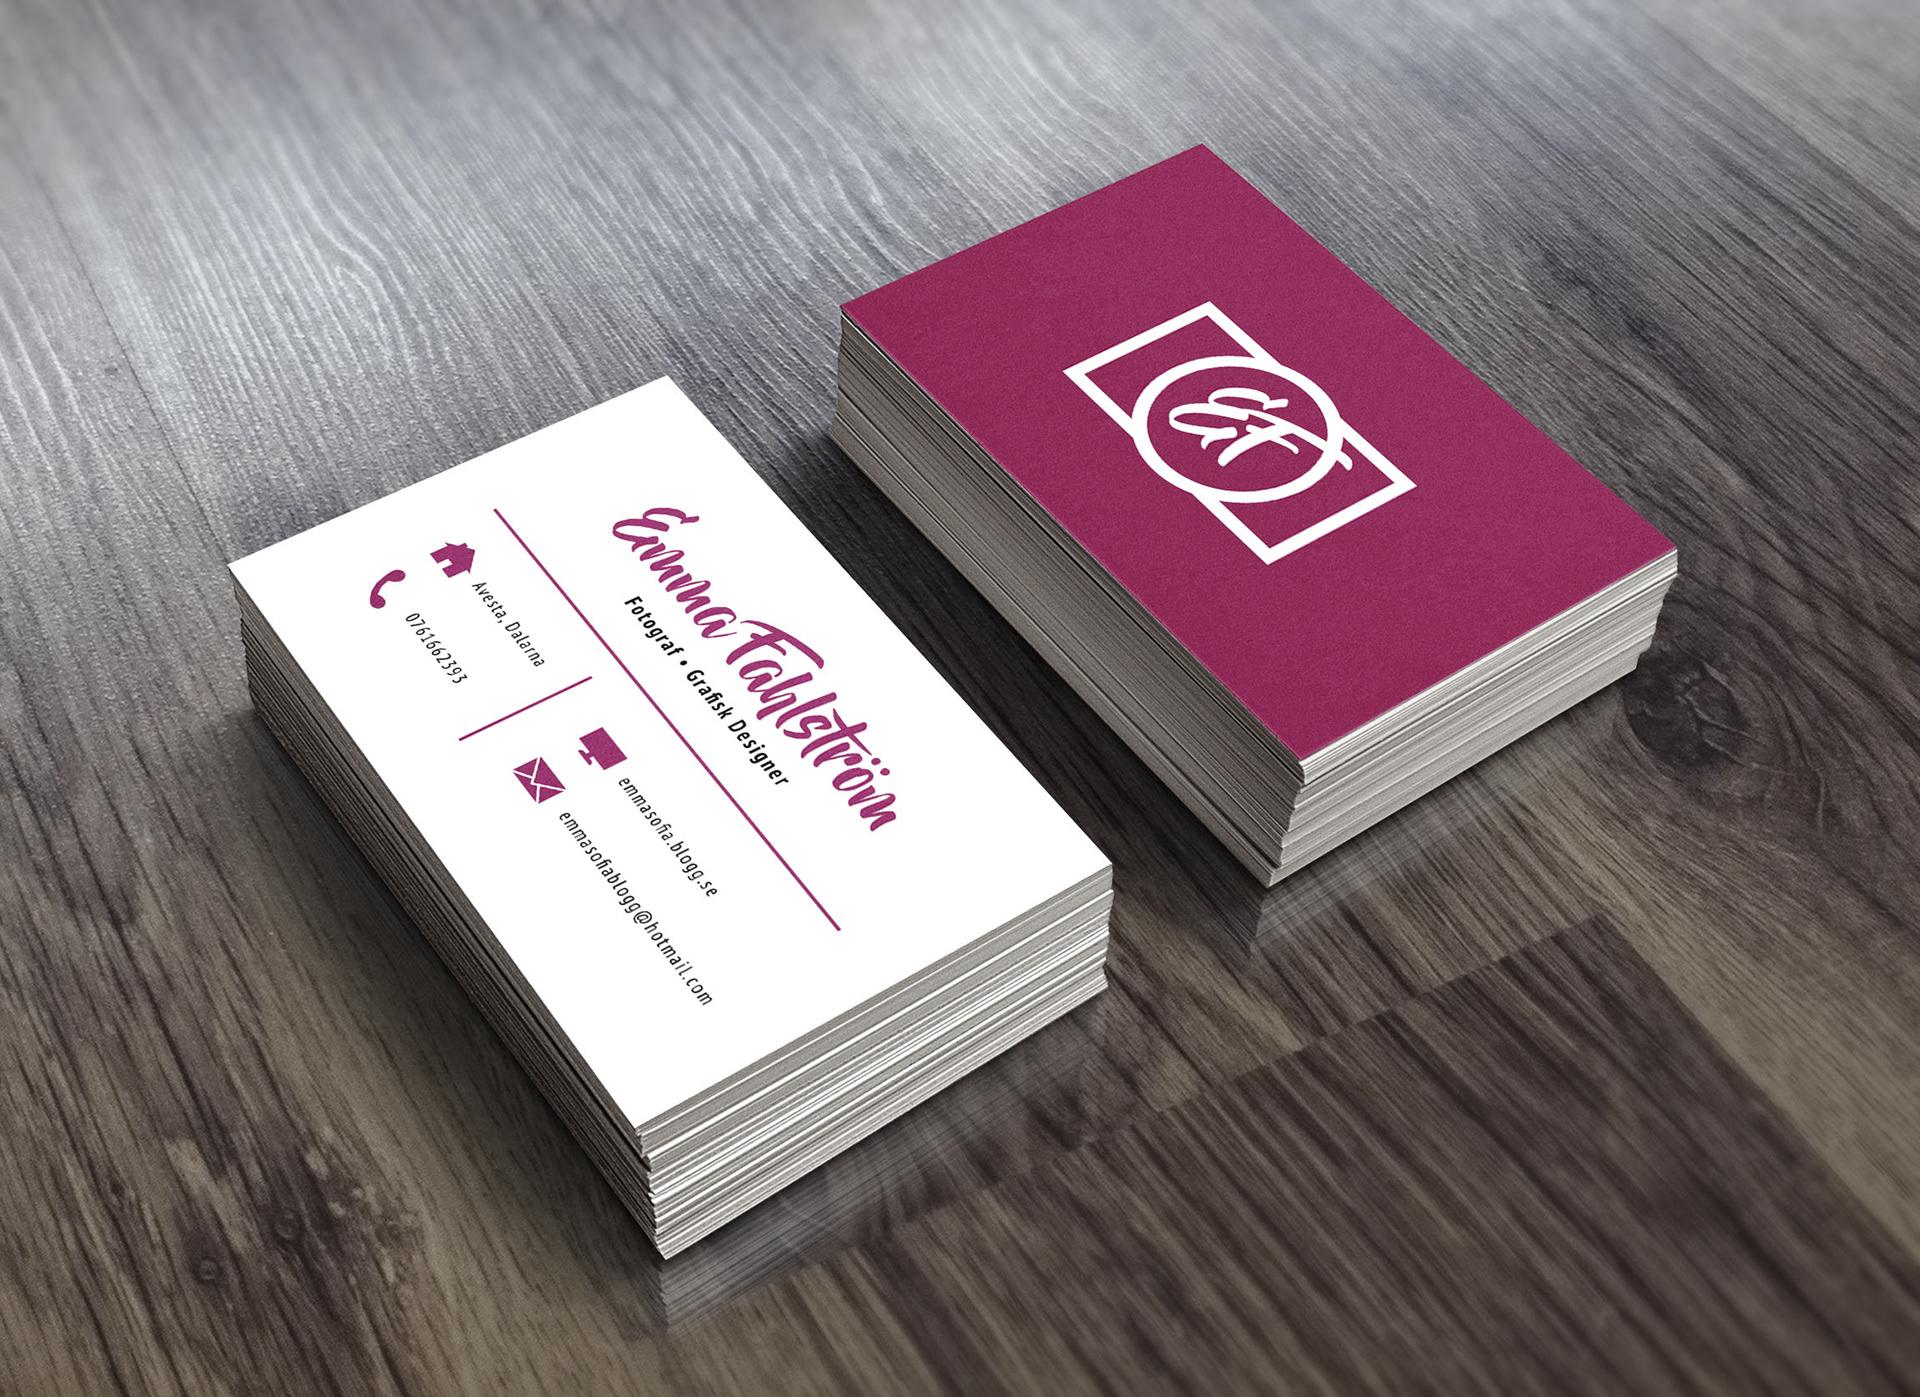 Stine Landin - Business cards